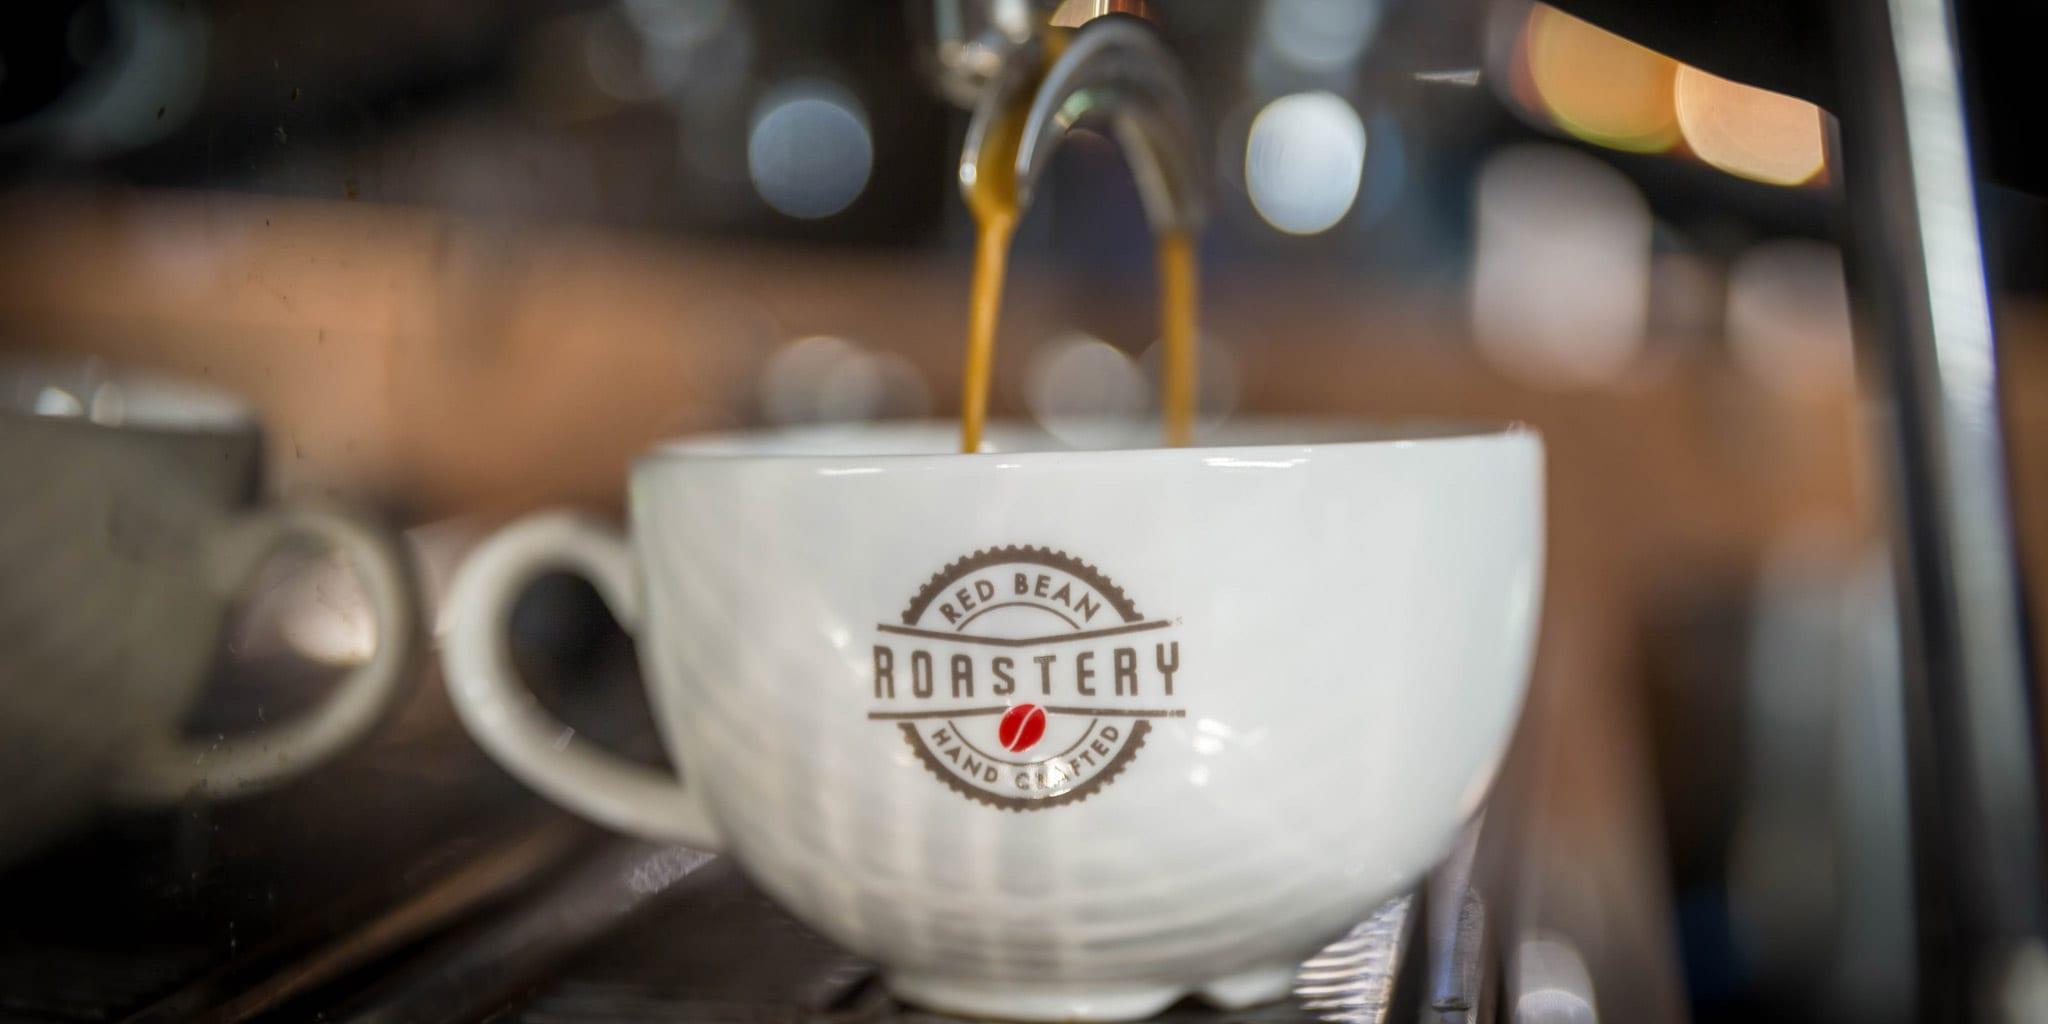 Barista-Espresso-Machine-Red-Bean-Roastery